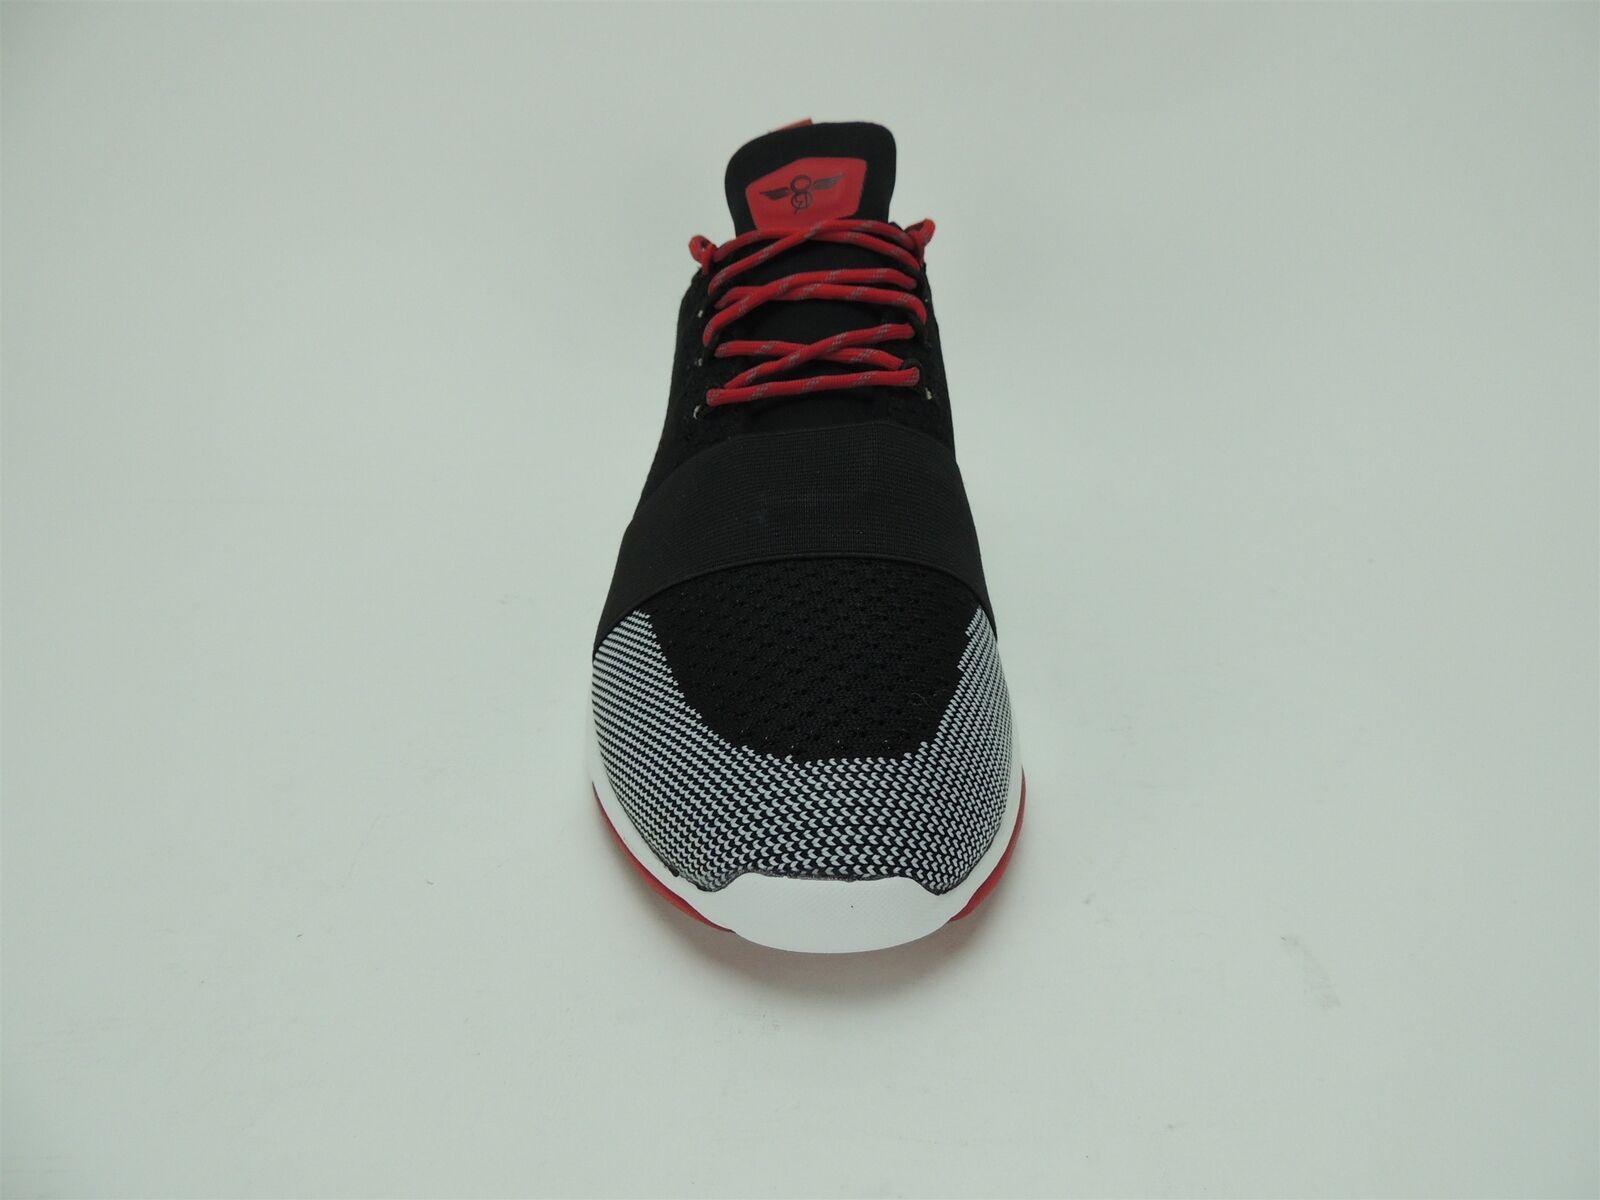 Creative Sneakers Recreaction Men's Ceroni Sneakers Creative Black/White/Red Size 9 M 0ae3d2